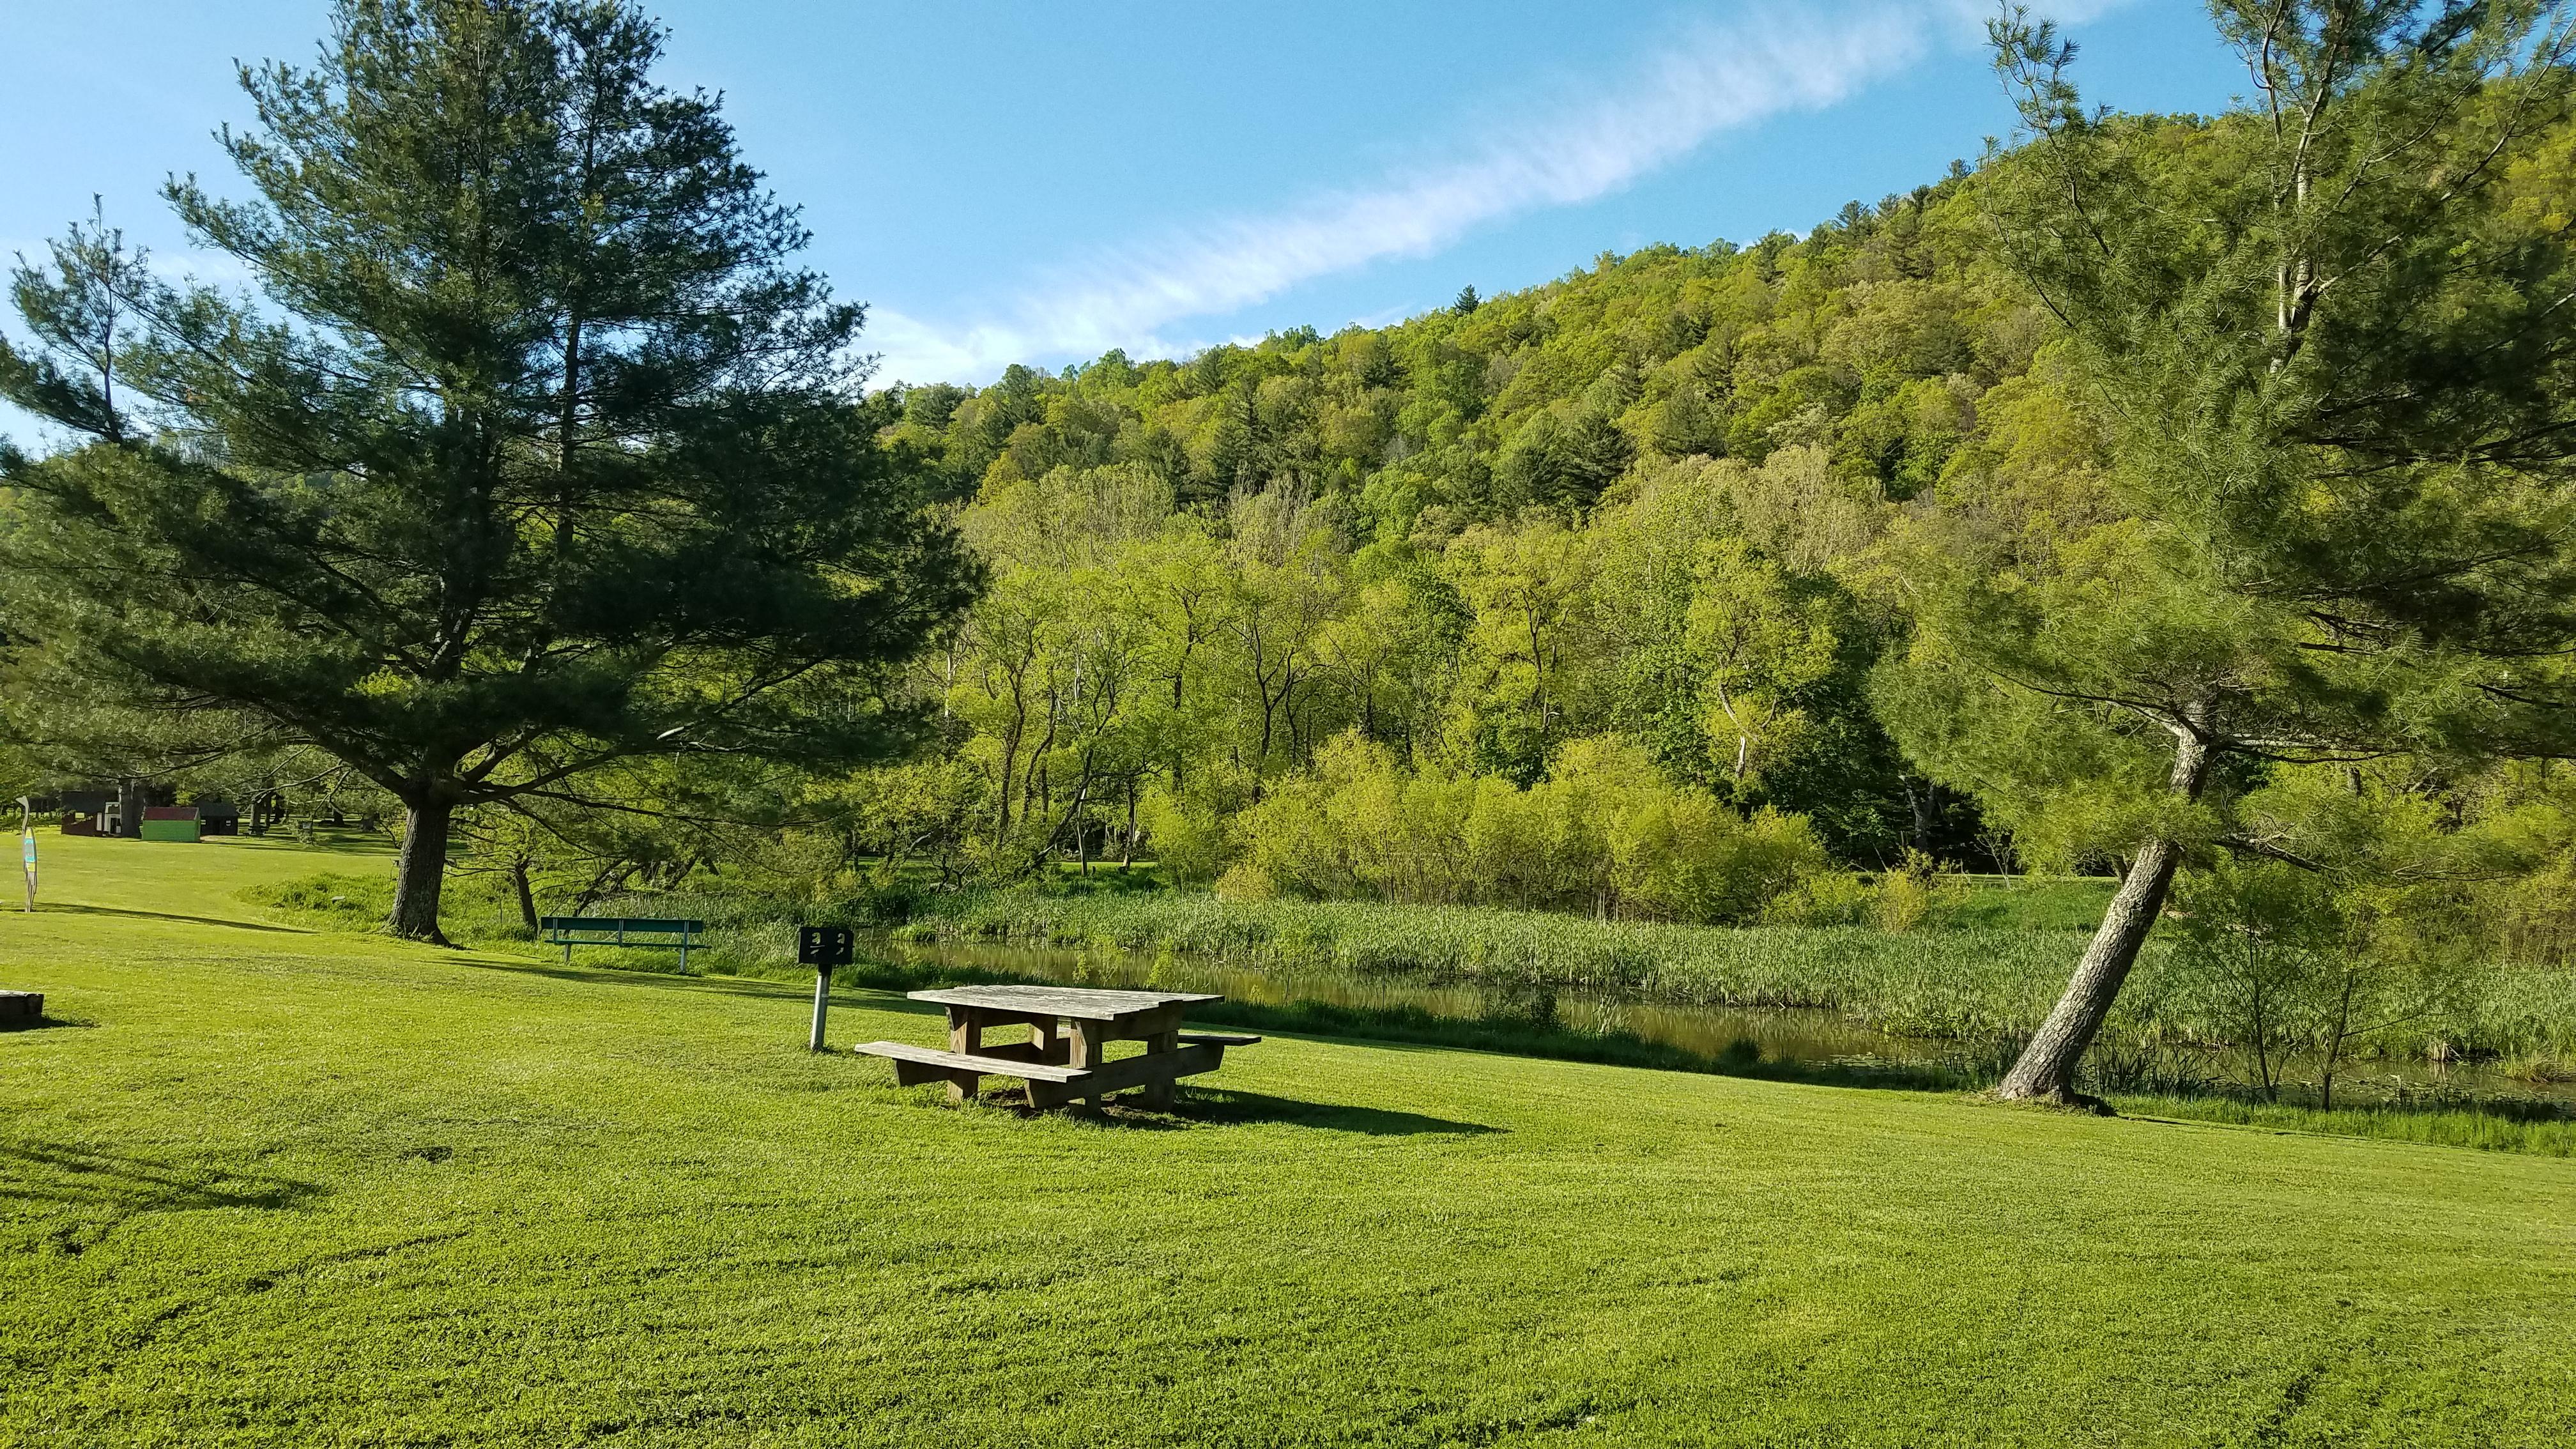 Valle Crucis Park Picnic Area